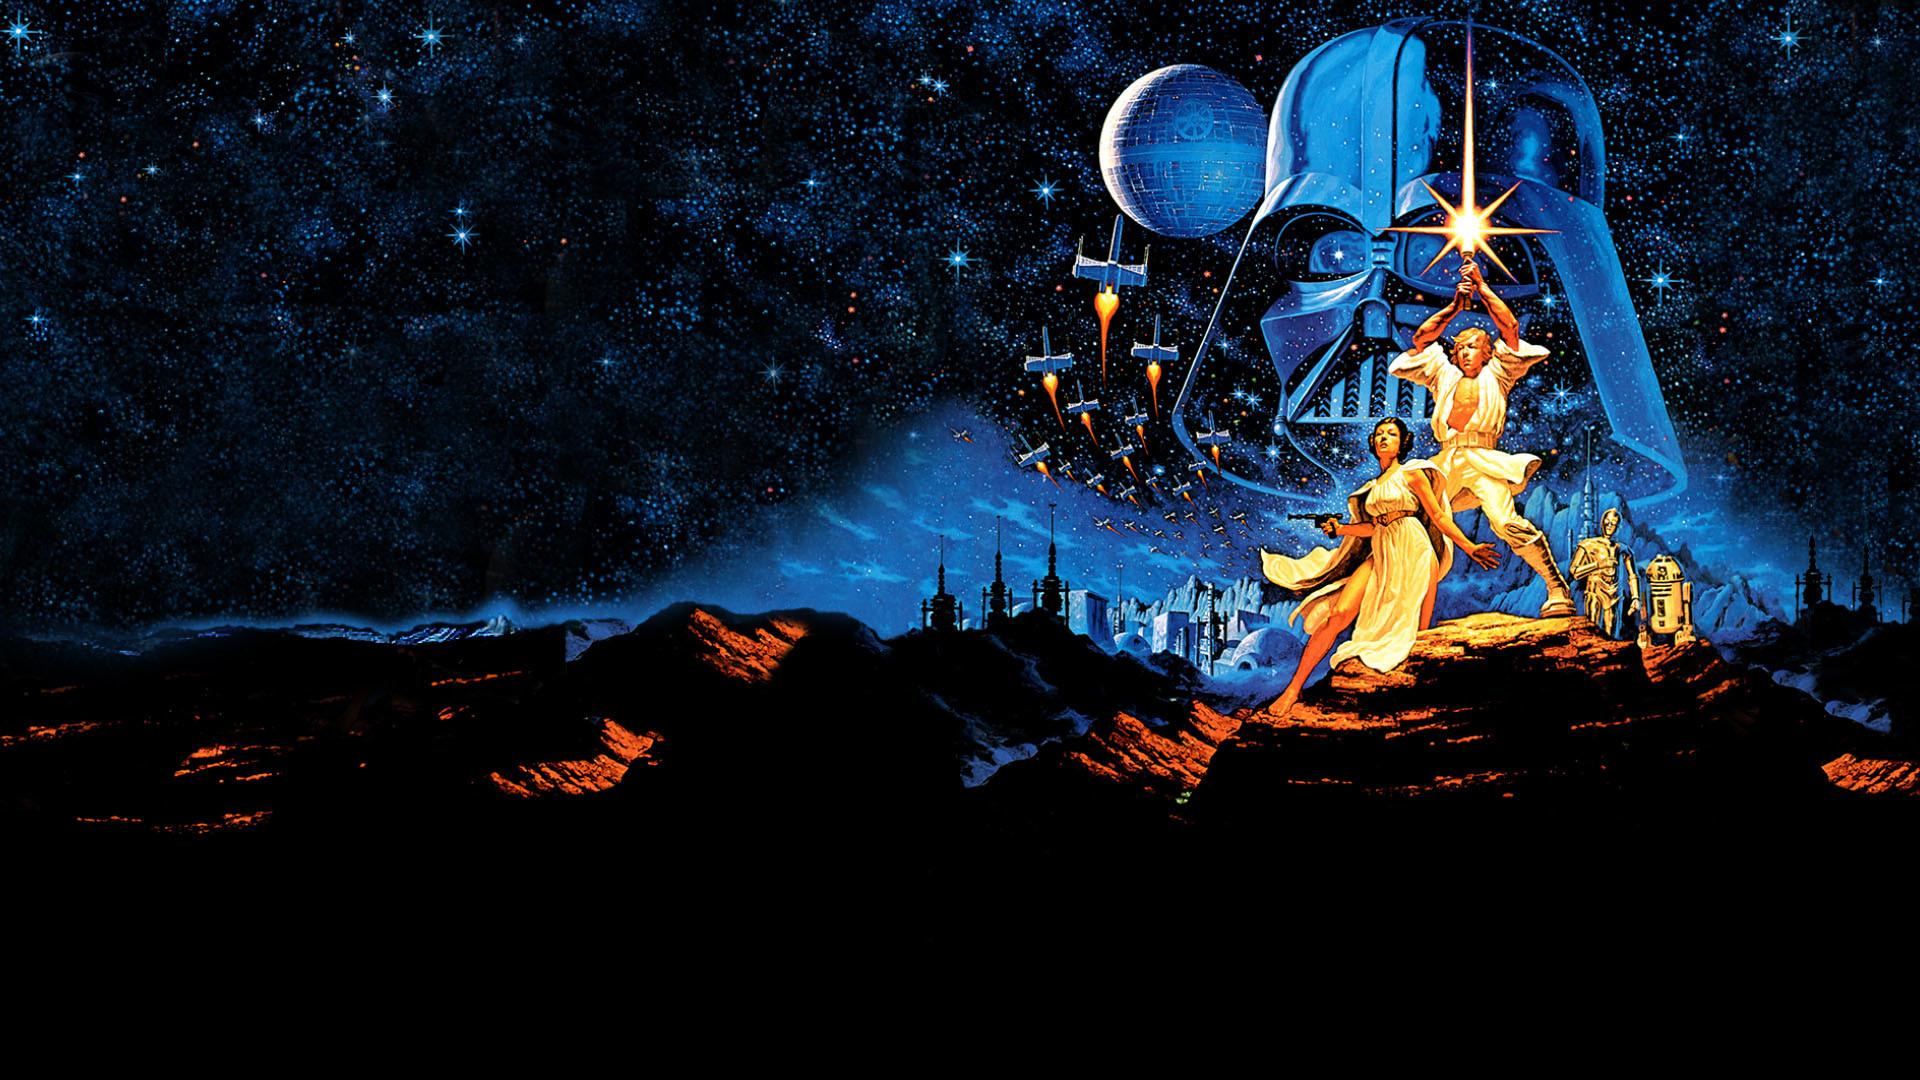 … hi res star wars wallpaper free download …